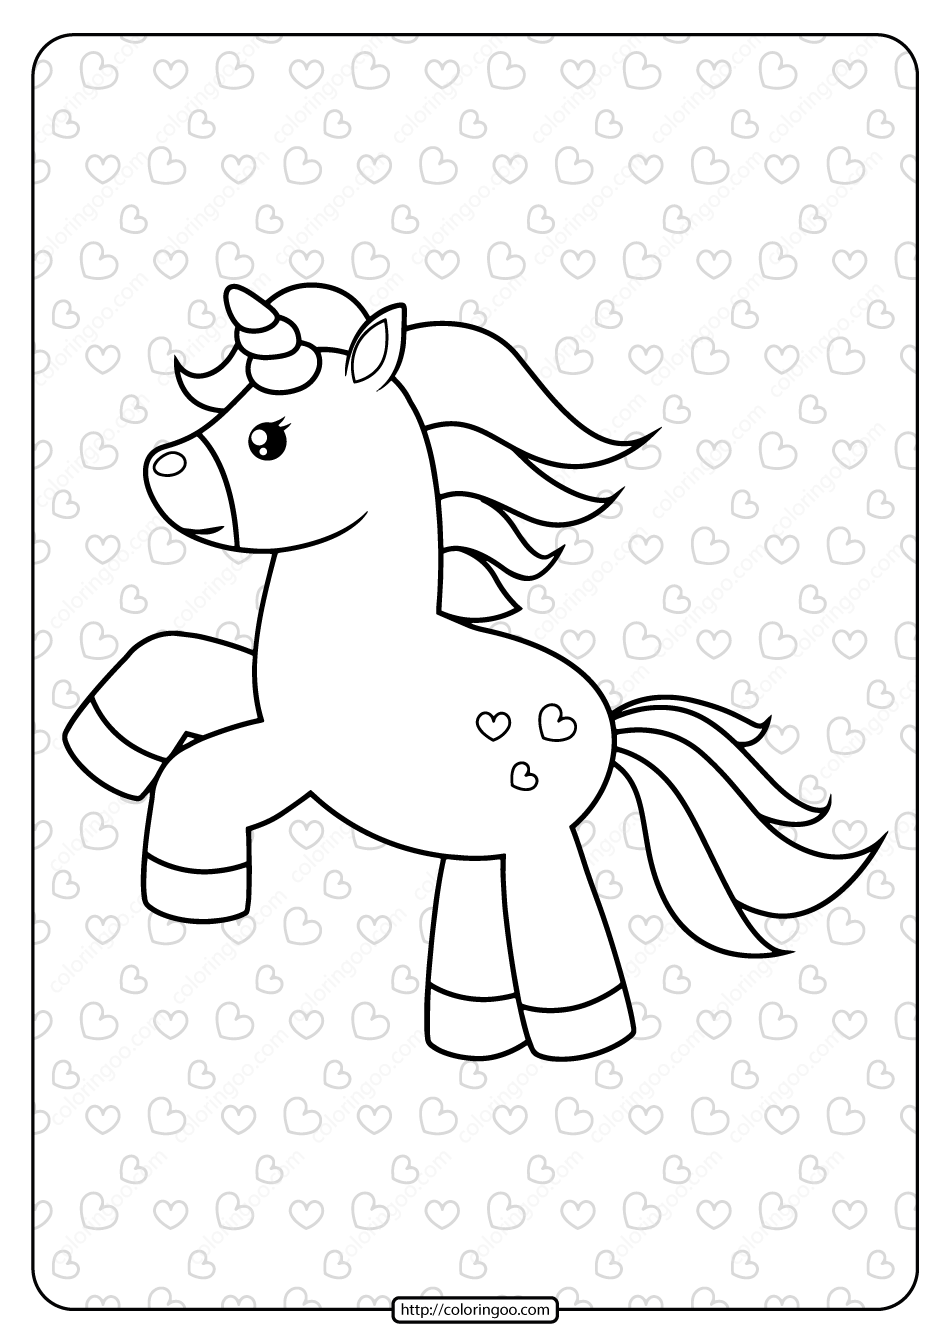 Free Printable Galloping Unicorn Coloring Page Unicorn Coloring Pages Coloring Pages Free Printables [ 1344 x 950 Pixel ]